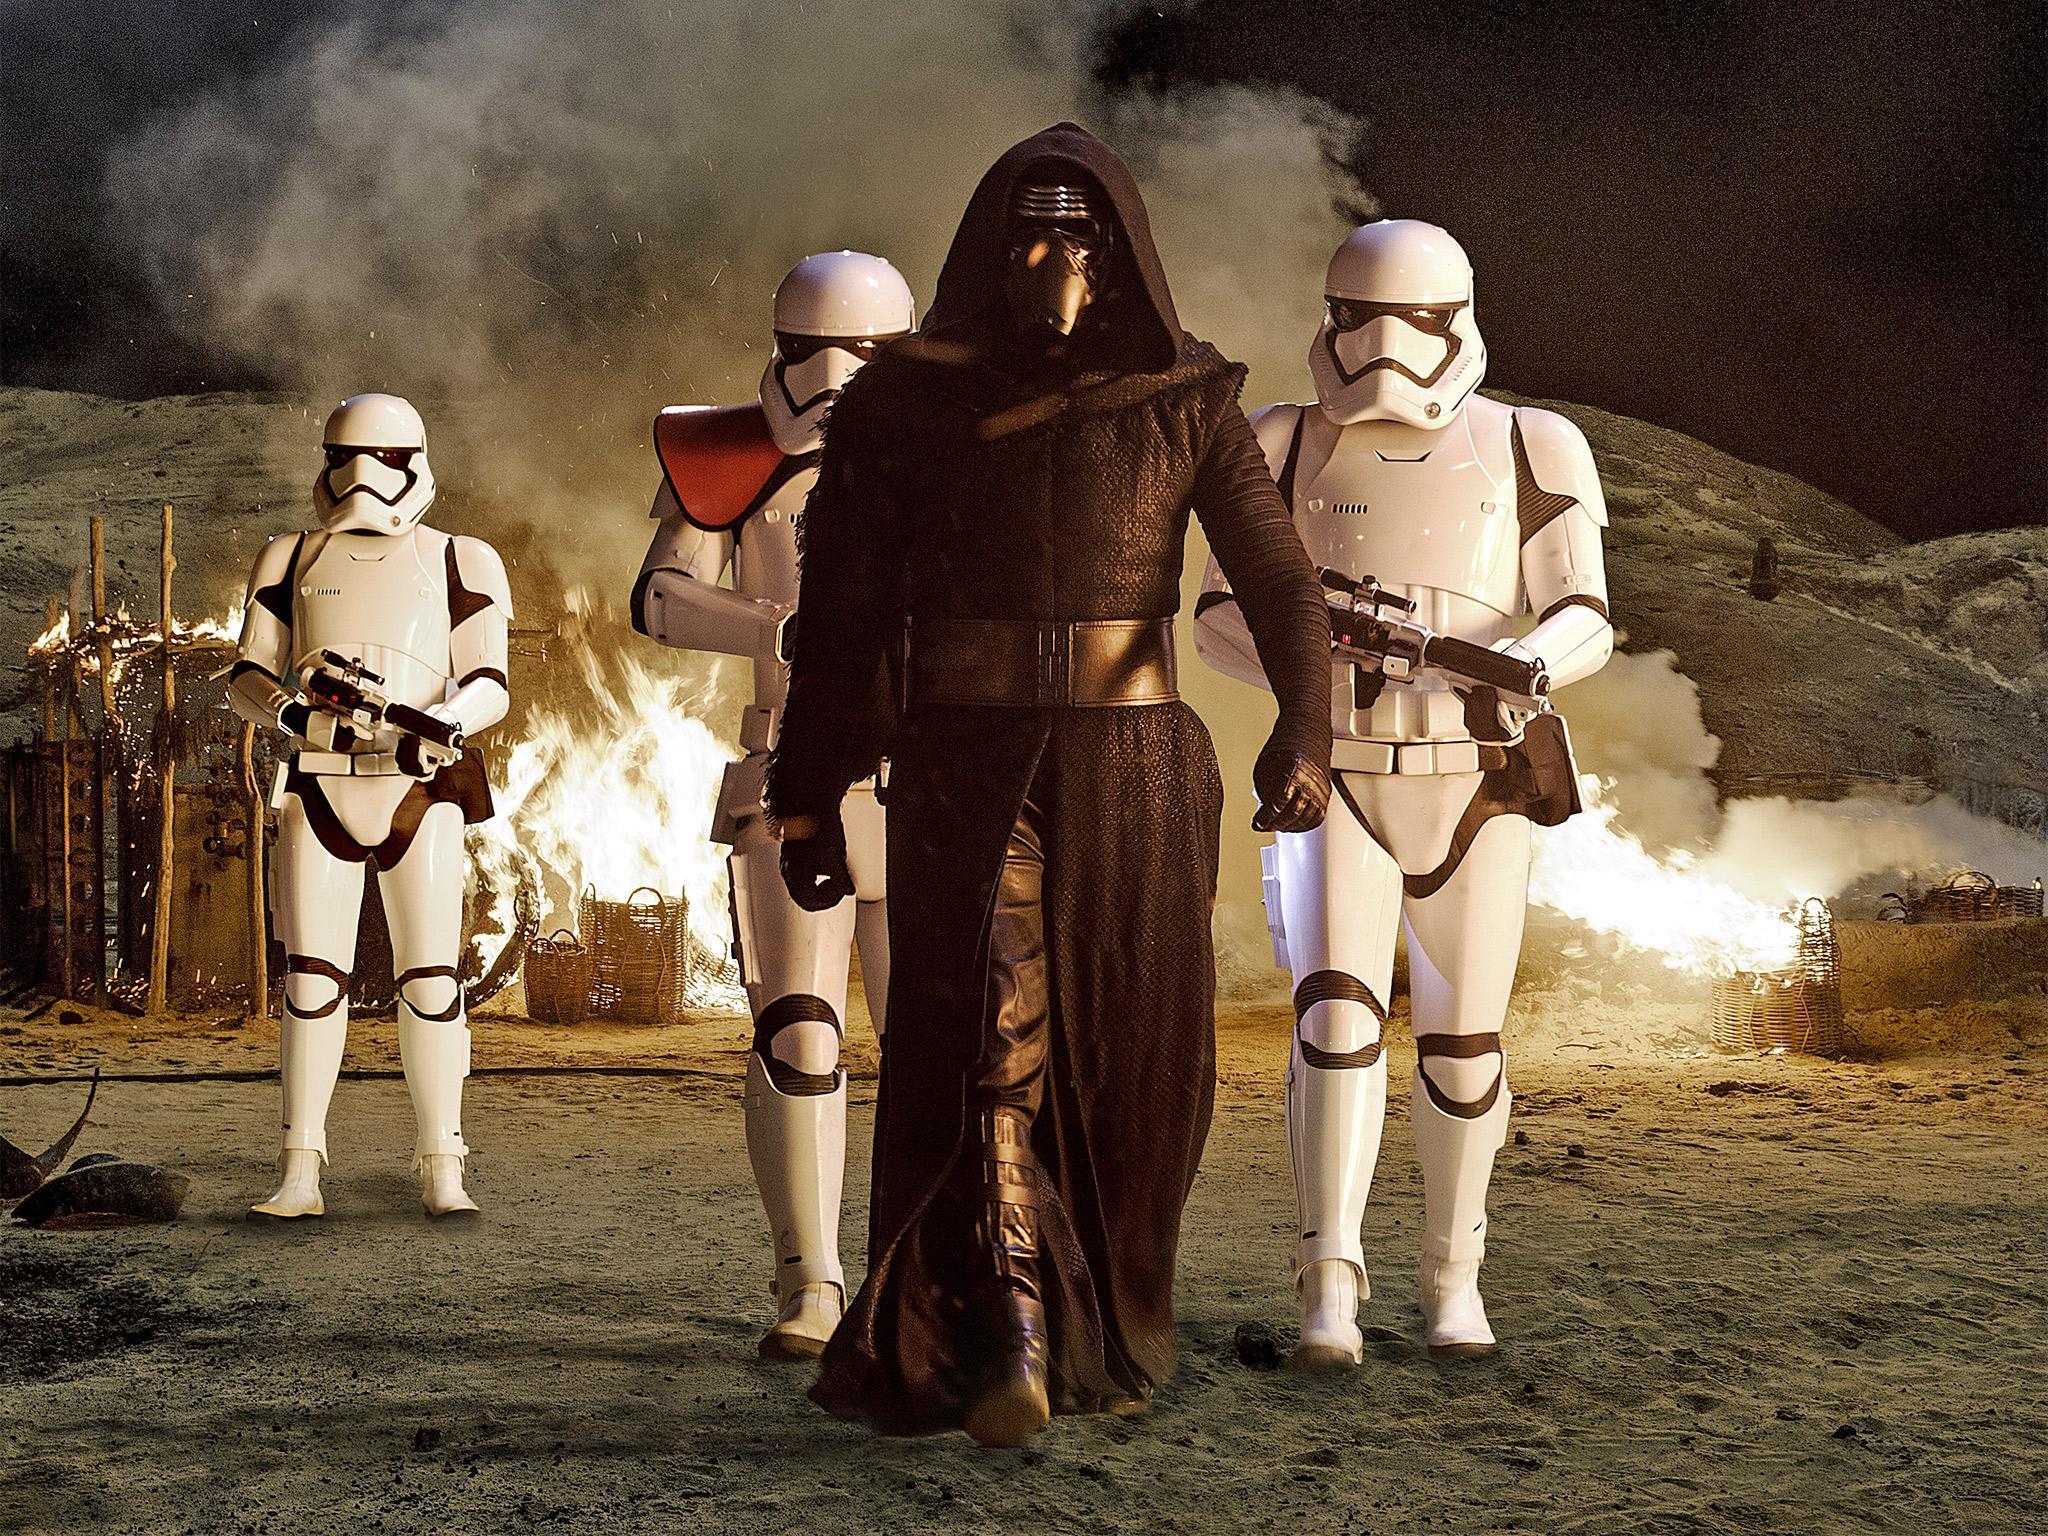 star wars the force awakens beats jurassic worlds global box office record taking 528m plus in one weekend ben office fan